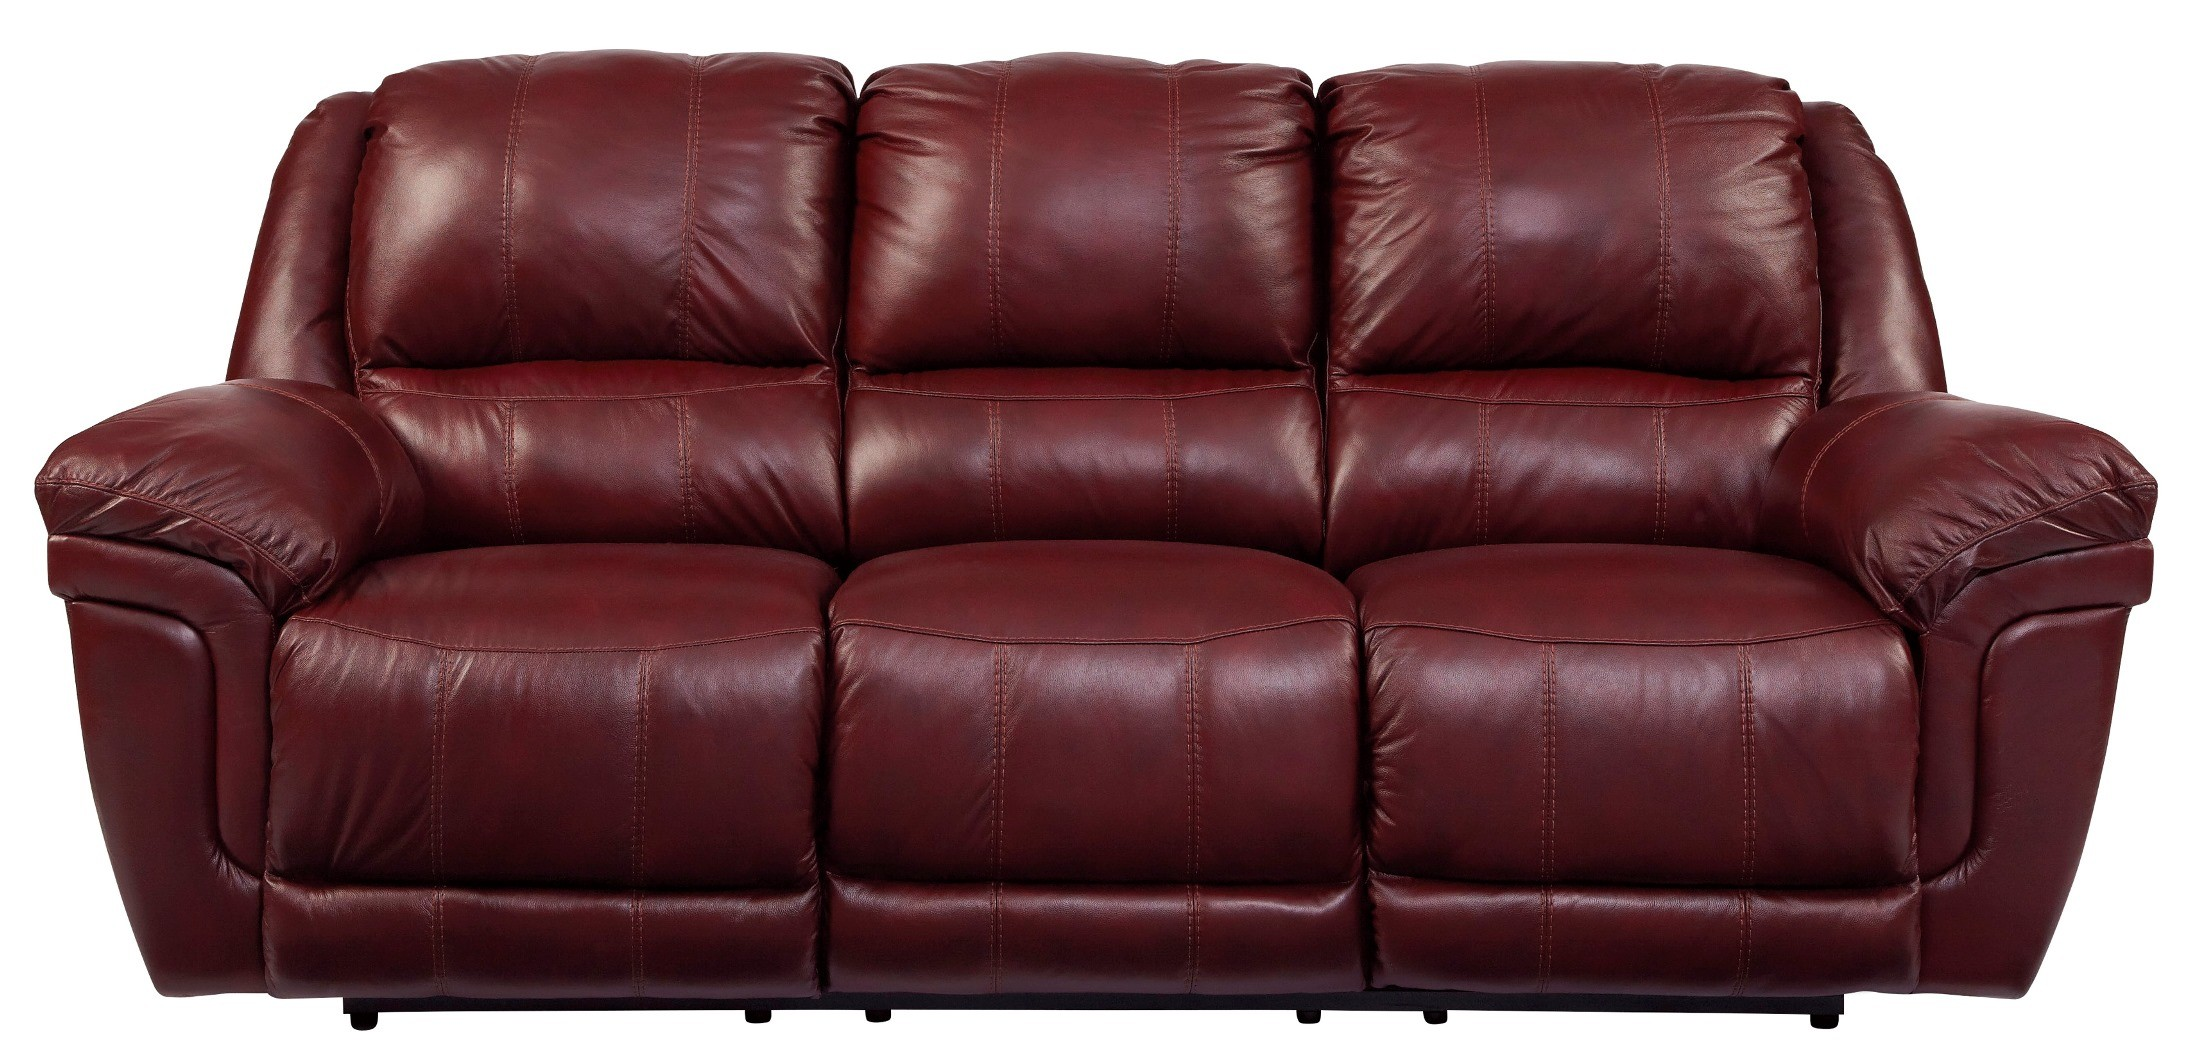 Altmont roma power reclining sofa 8380287 ashley furniture - Sofa roma ...